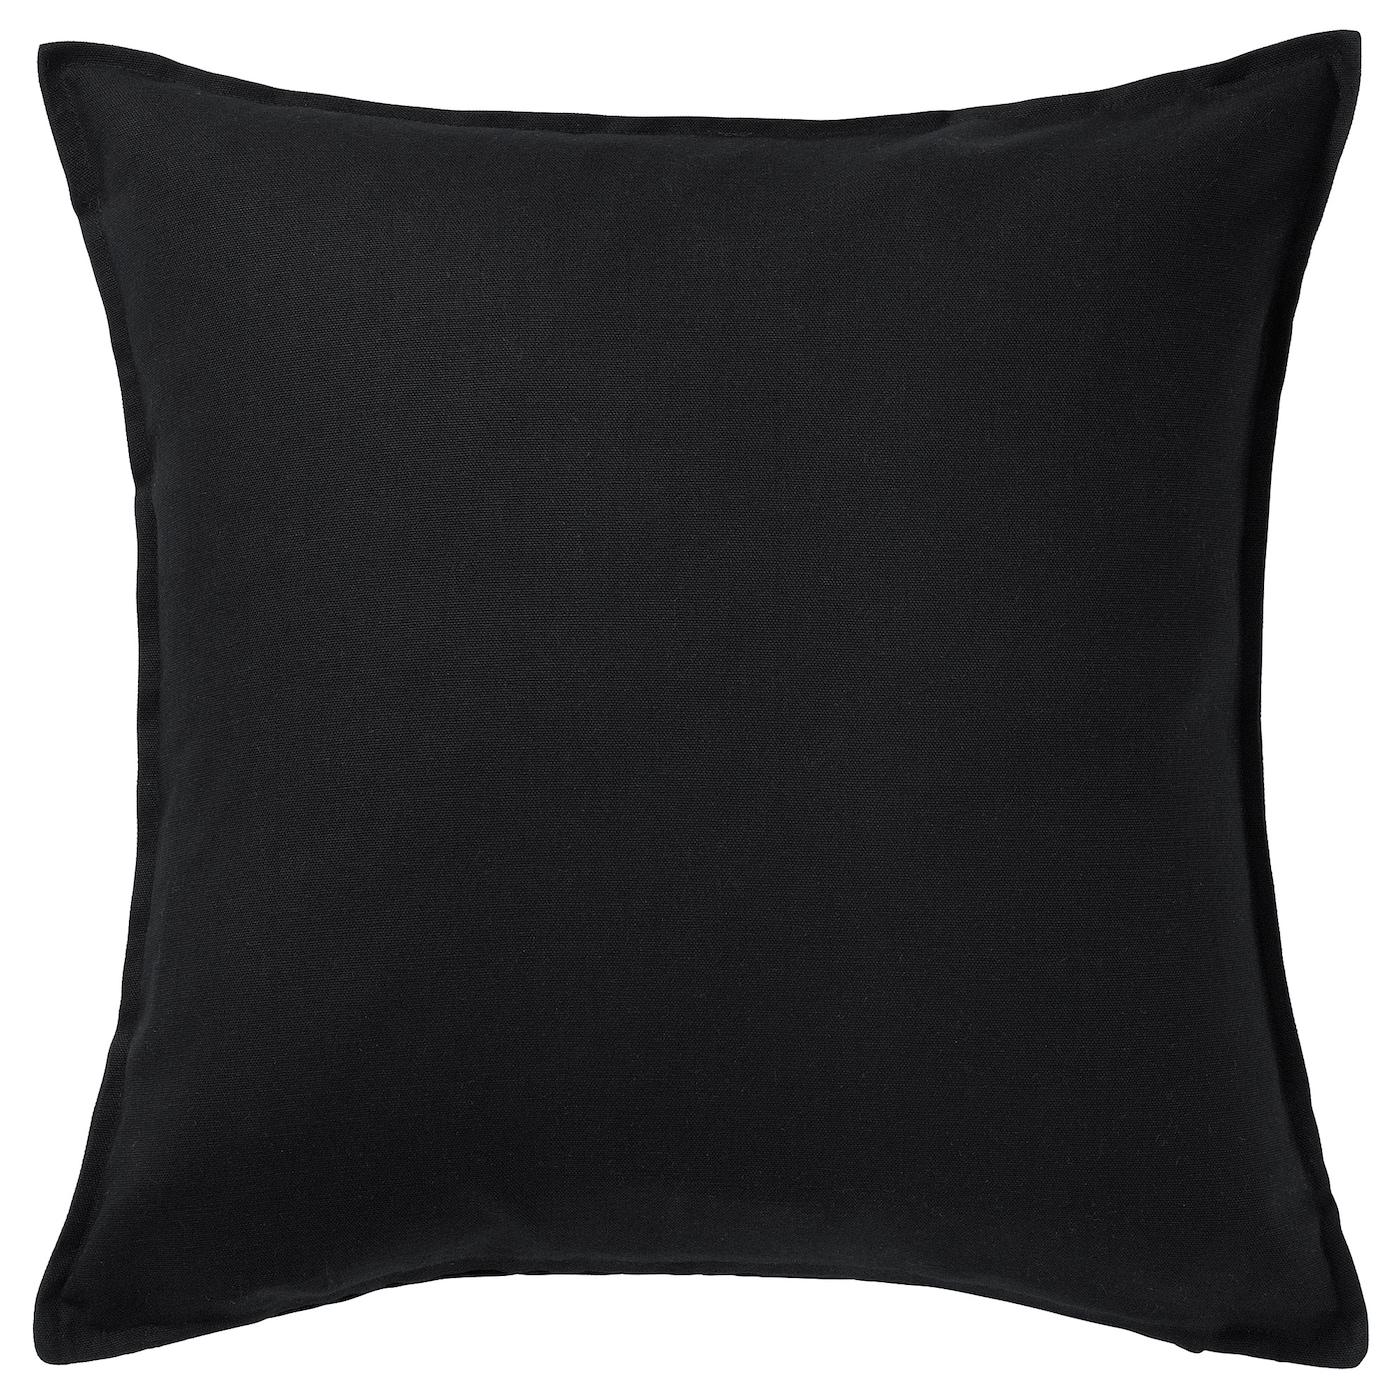 stockholm cushion black white 50 x 50 cm ikea. Black Bedroom Furniture Sets. Home Design Ideas